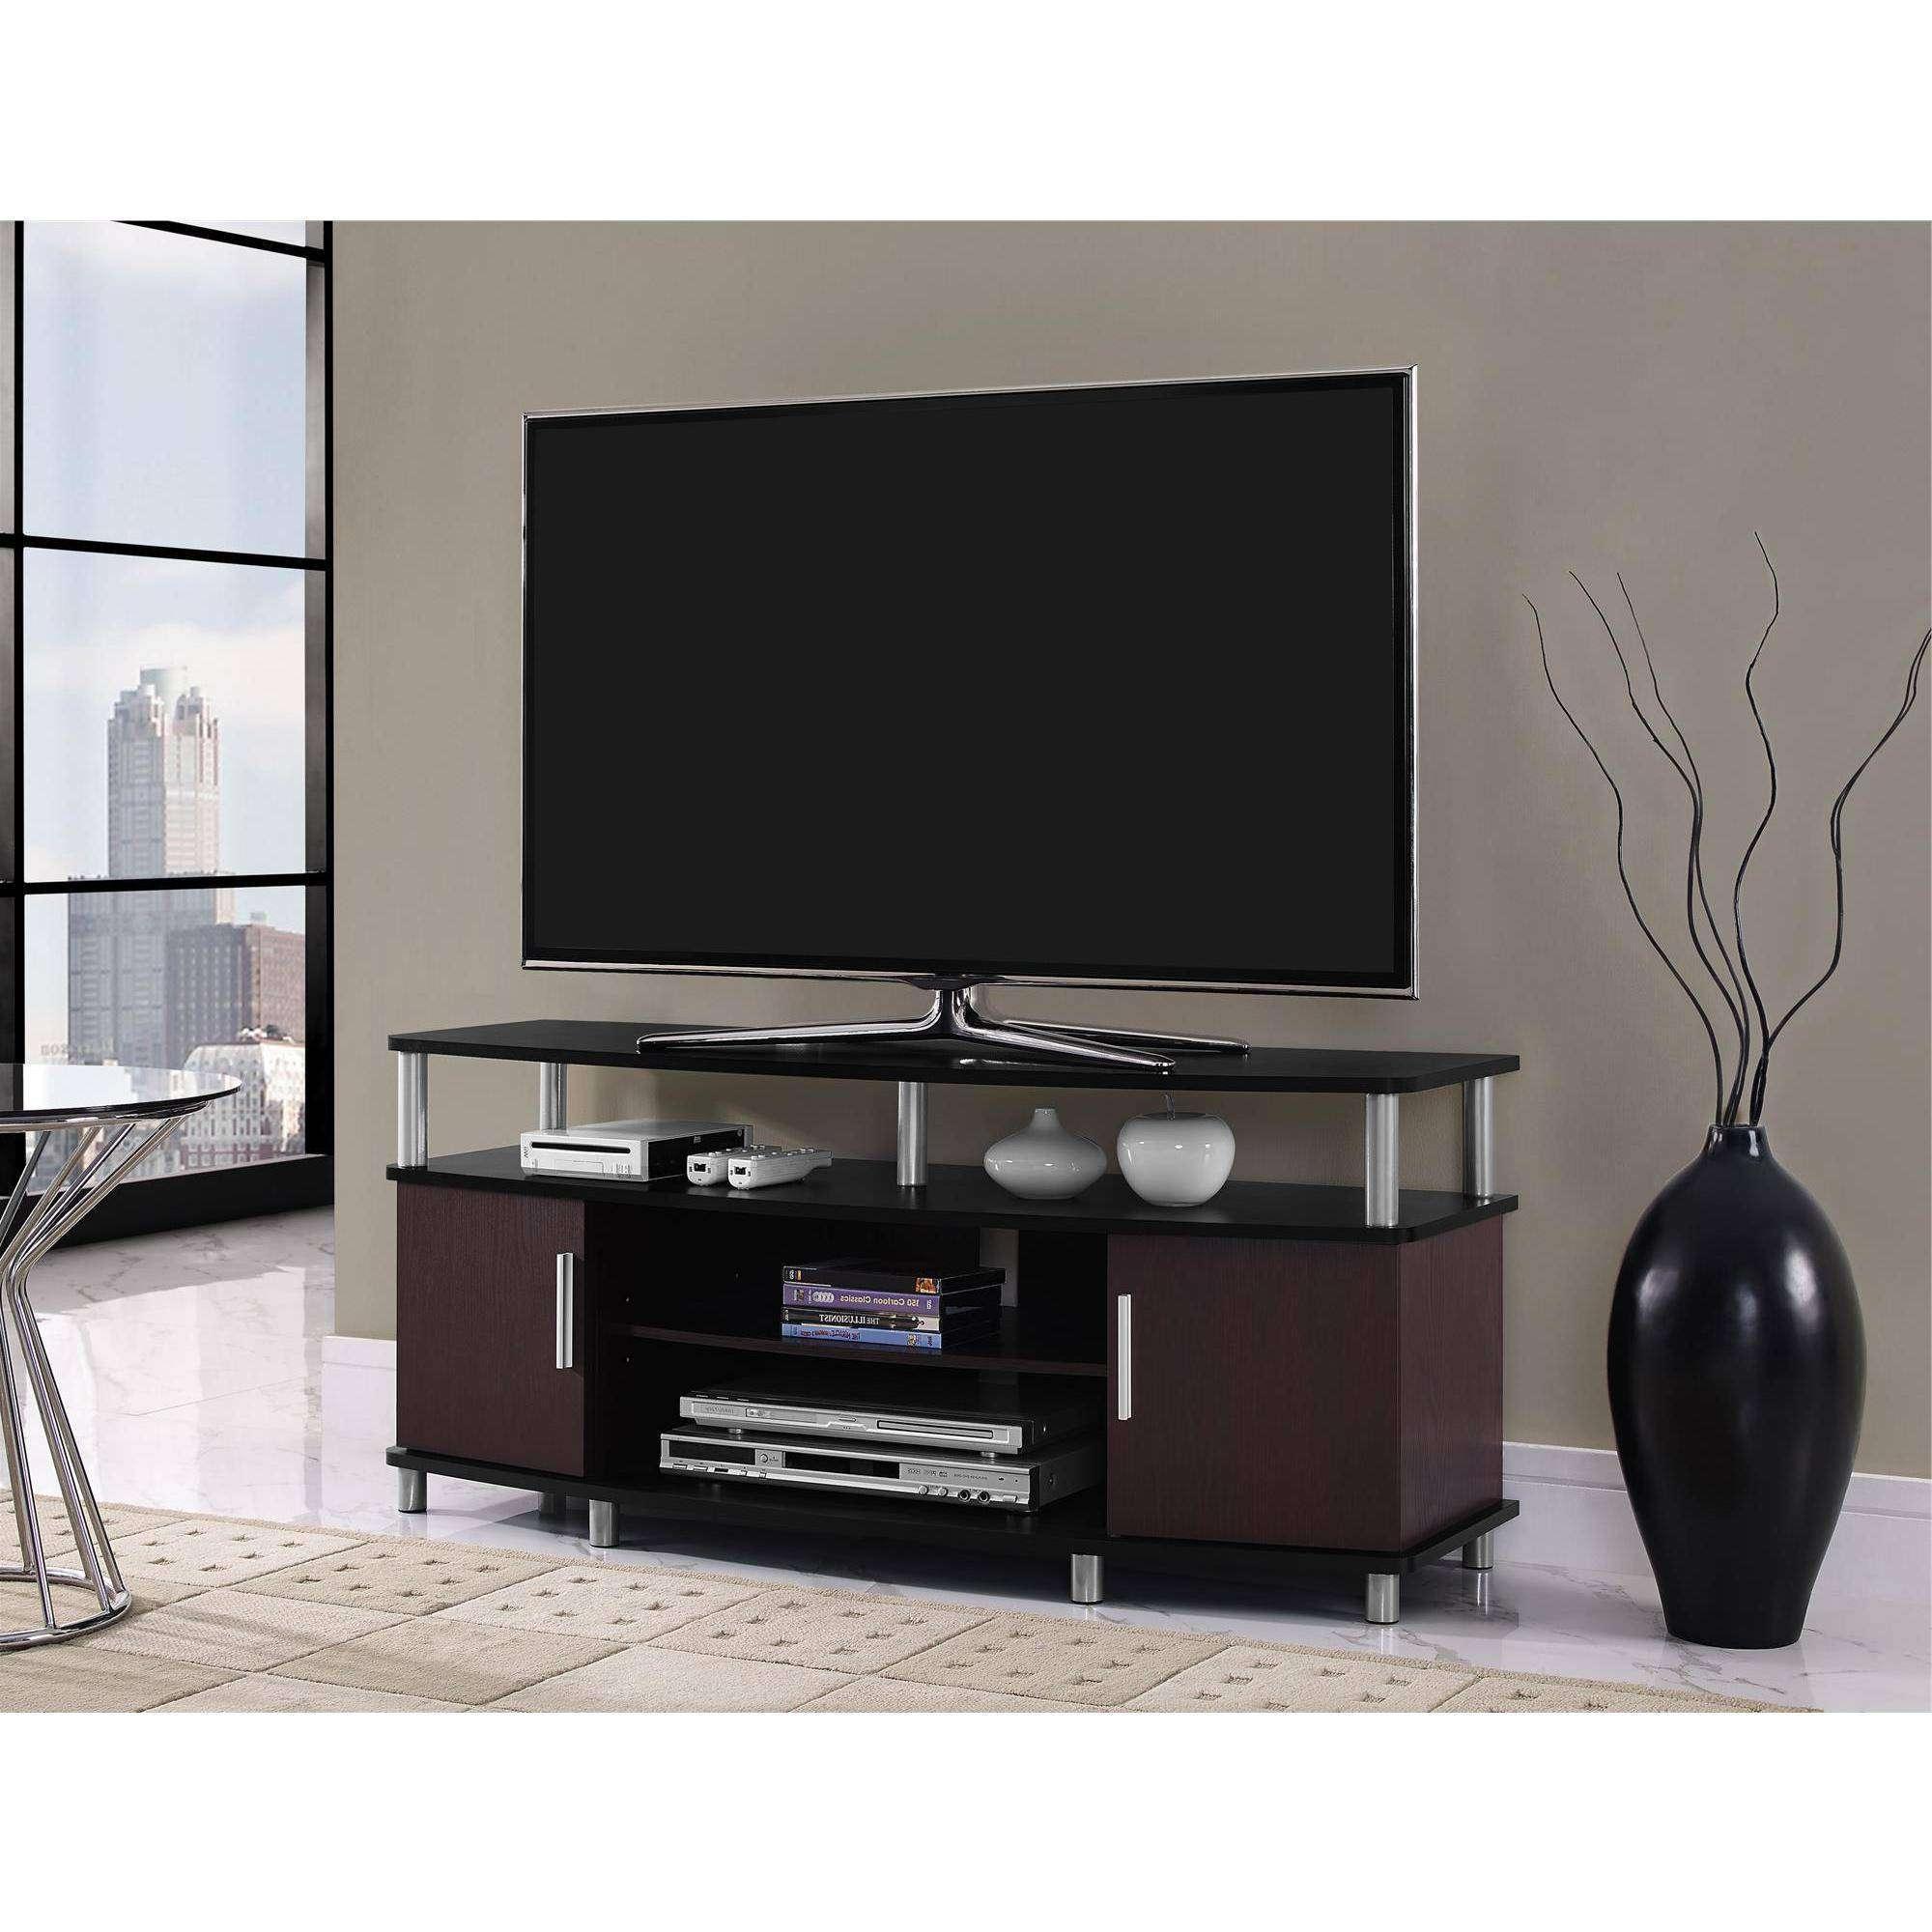 Tv Stands & Entertainment Centers – Walmart Regarding Light Cherry Tv Stands (View 5 of 15)